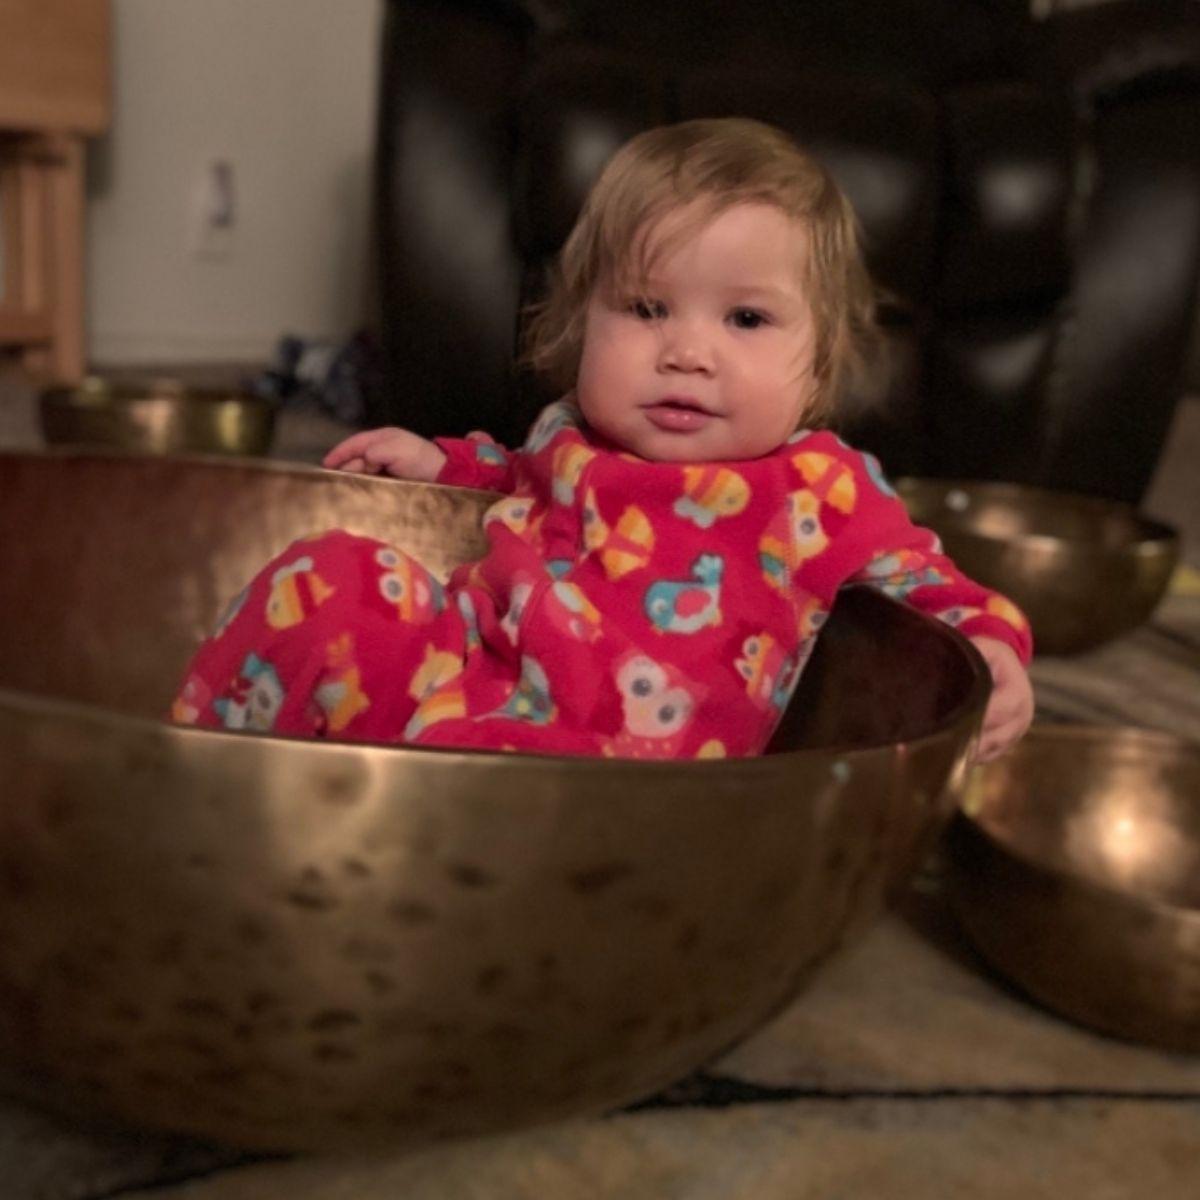 Baby wearing colorful pjs laying in a large healing singing bowl